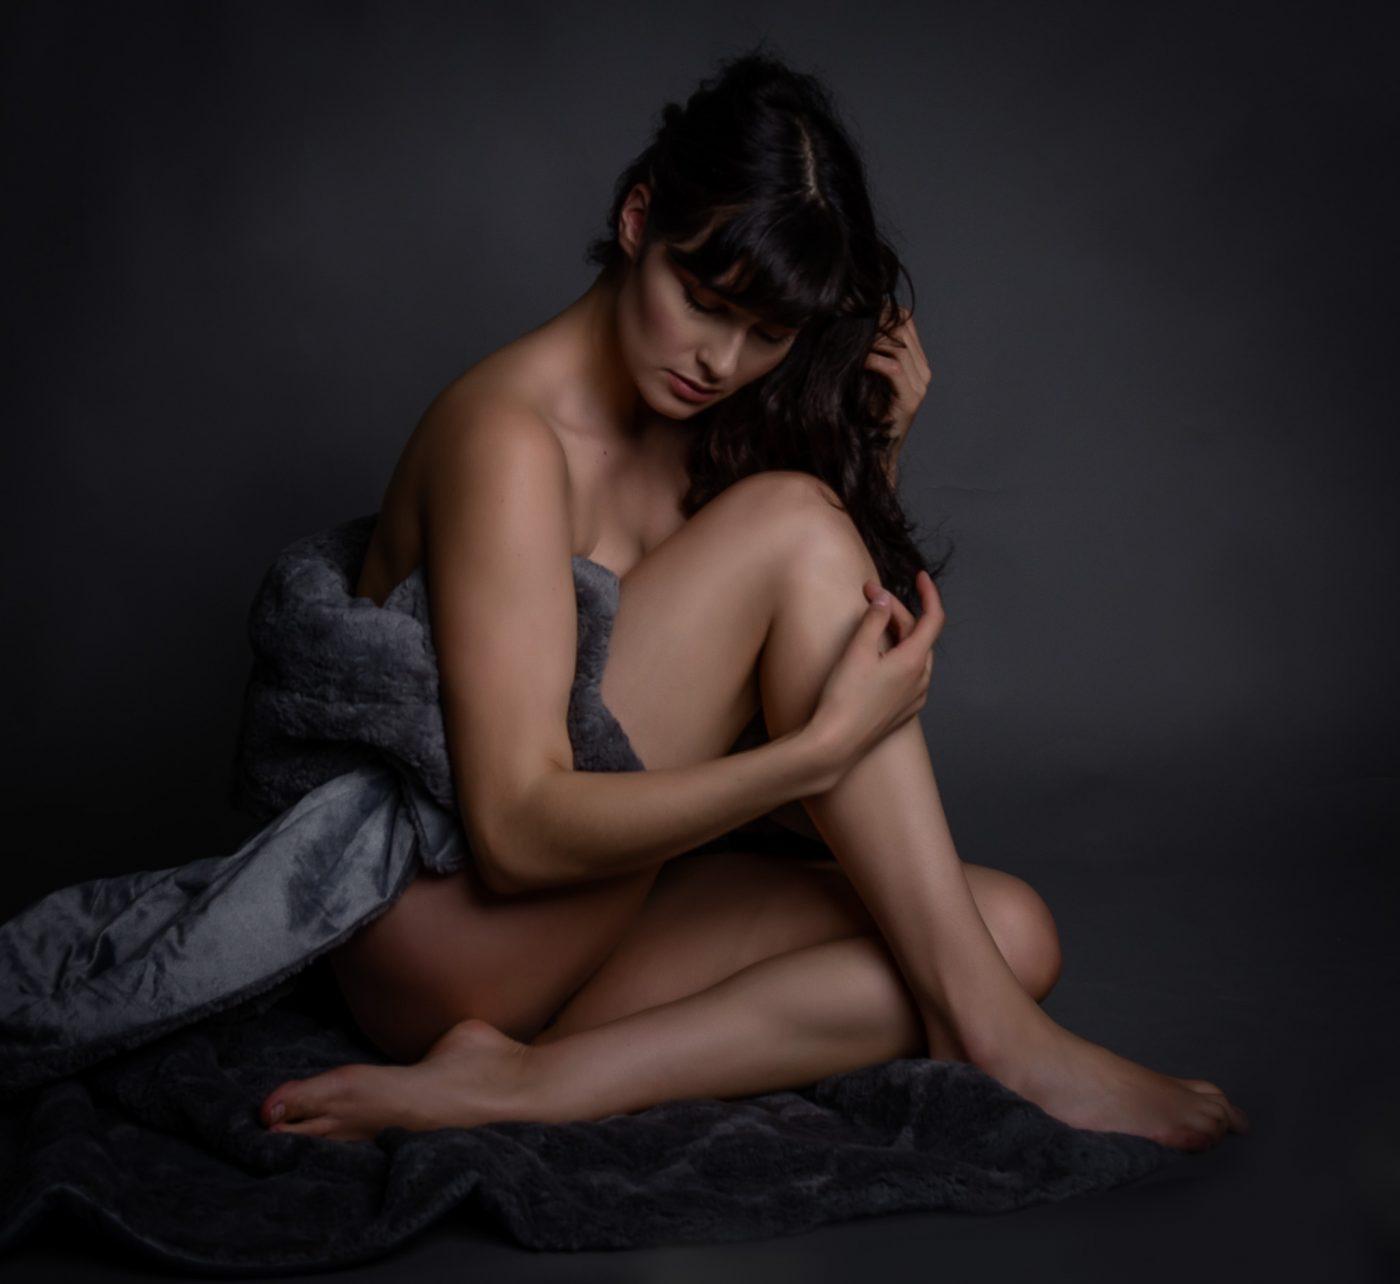 Next level visuals nlv male photographer profile